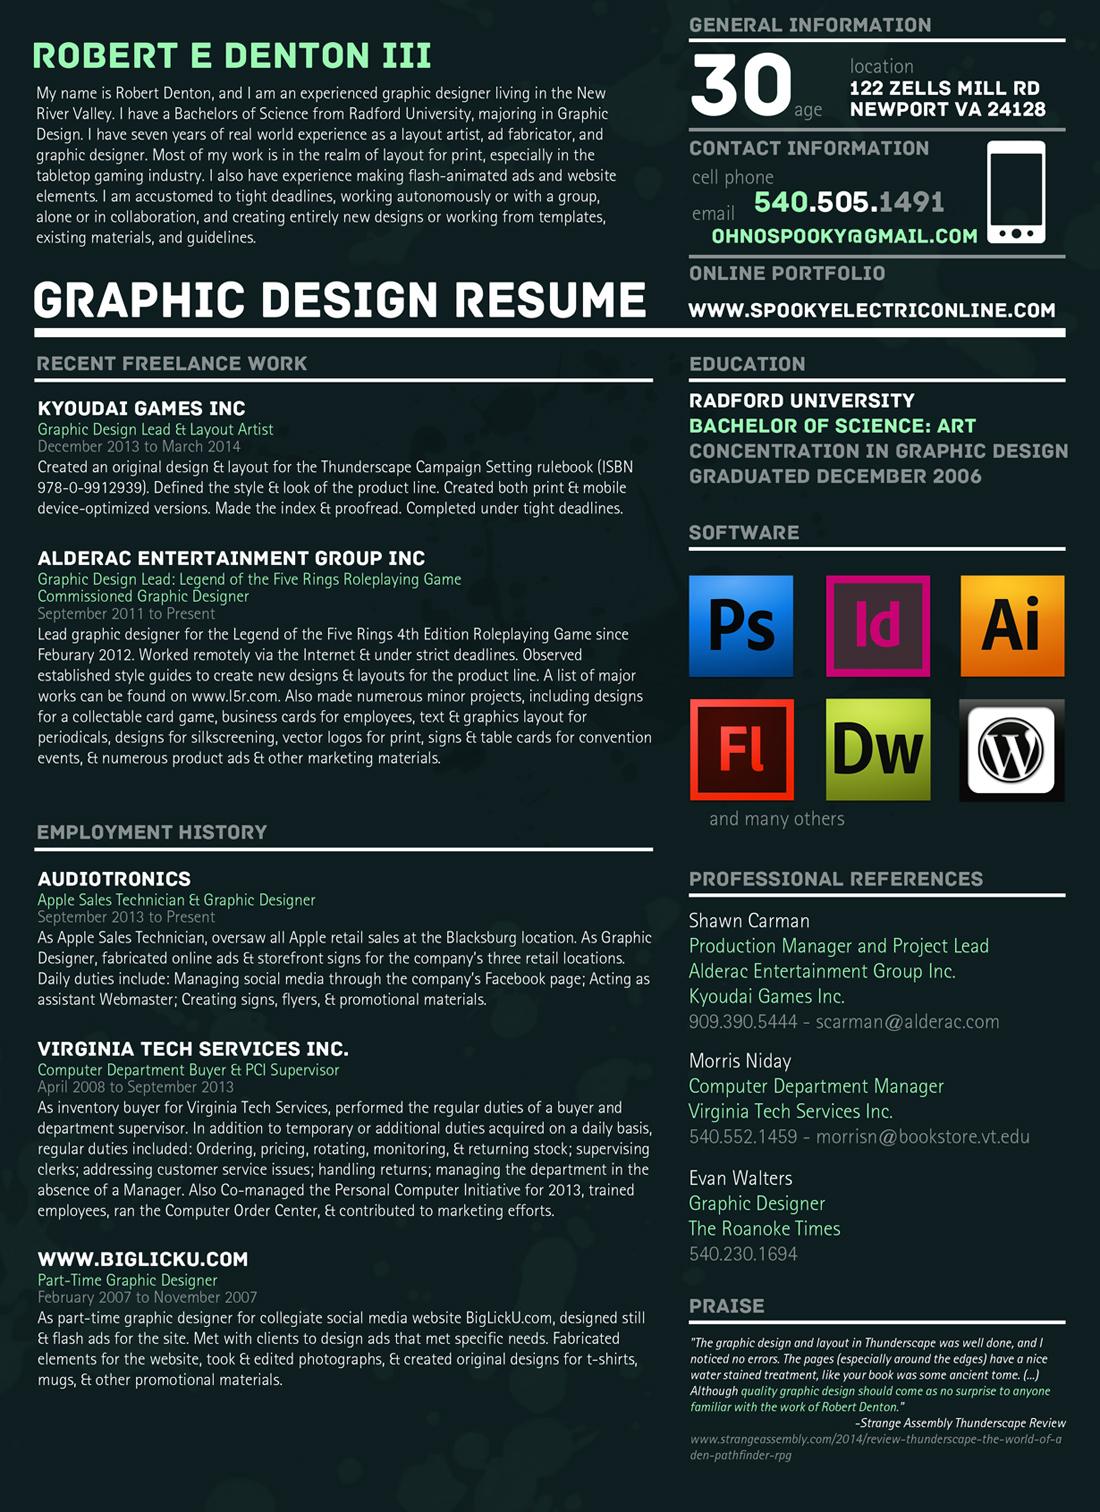 quick resume maker online sample customer service resume quick resume maker online resumemaker write a better resume get a better job resume design resume